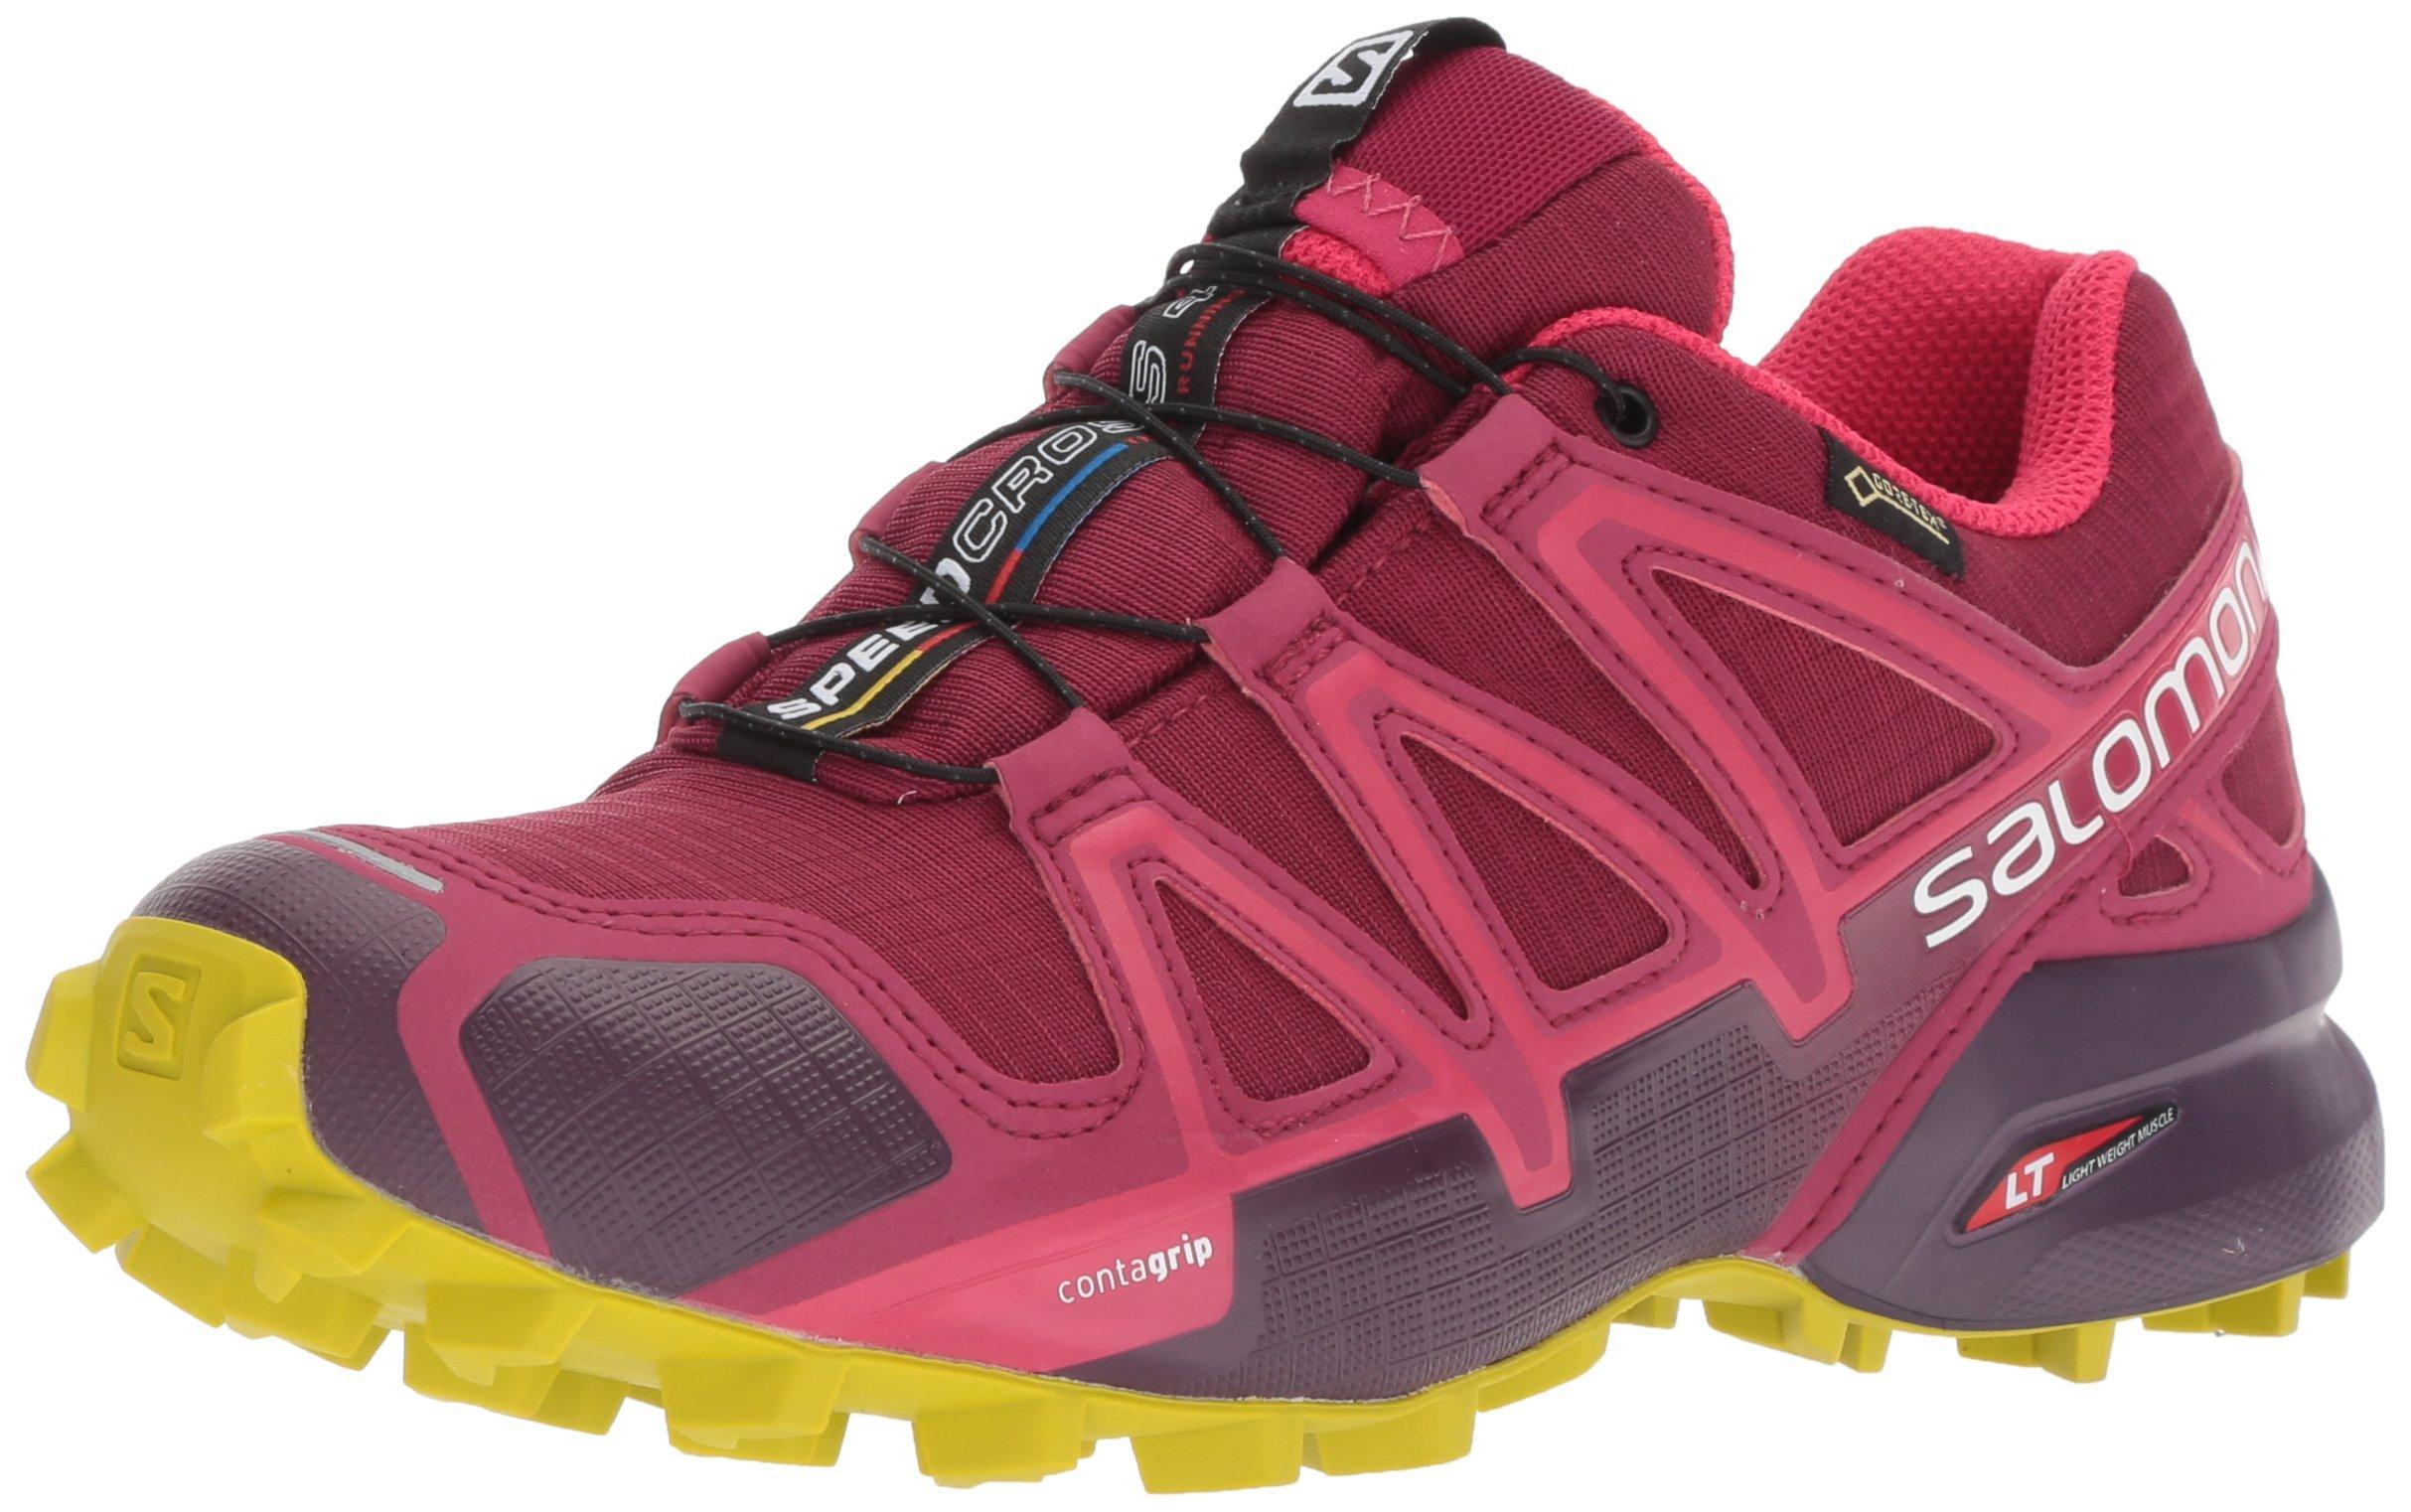 Salomon Women's Speedcross 4 GTX W Trail Running Shoe, Beet red/Potent Purple/Citronelle, 11 M US by Salomon